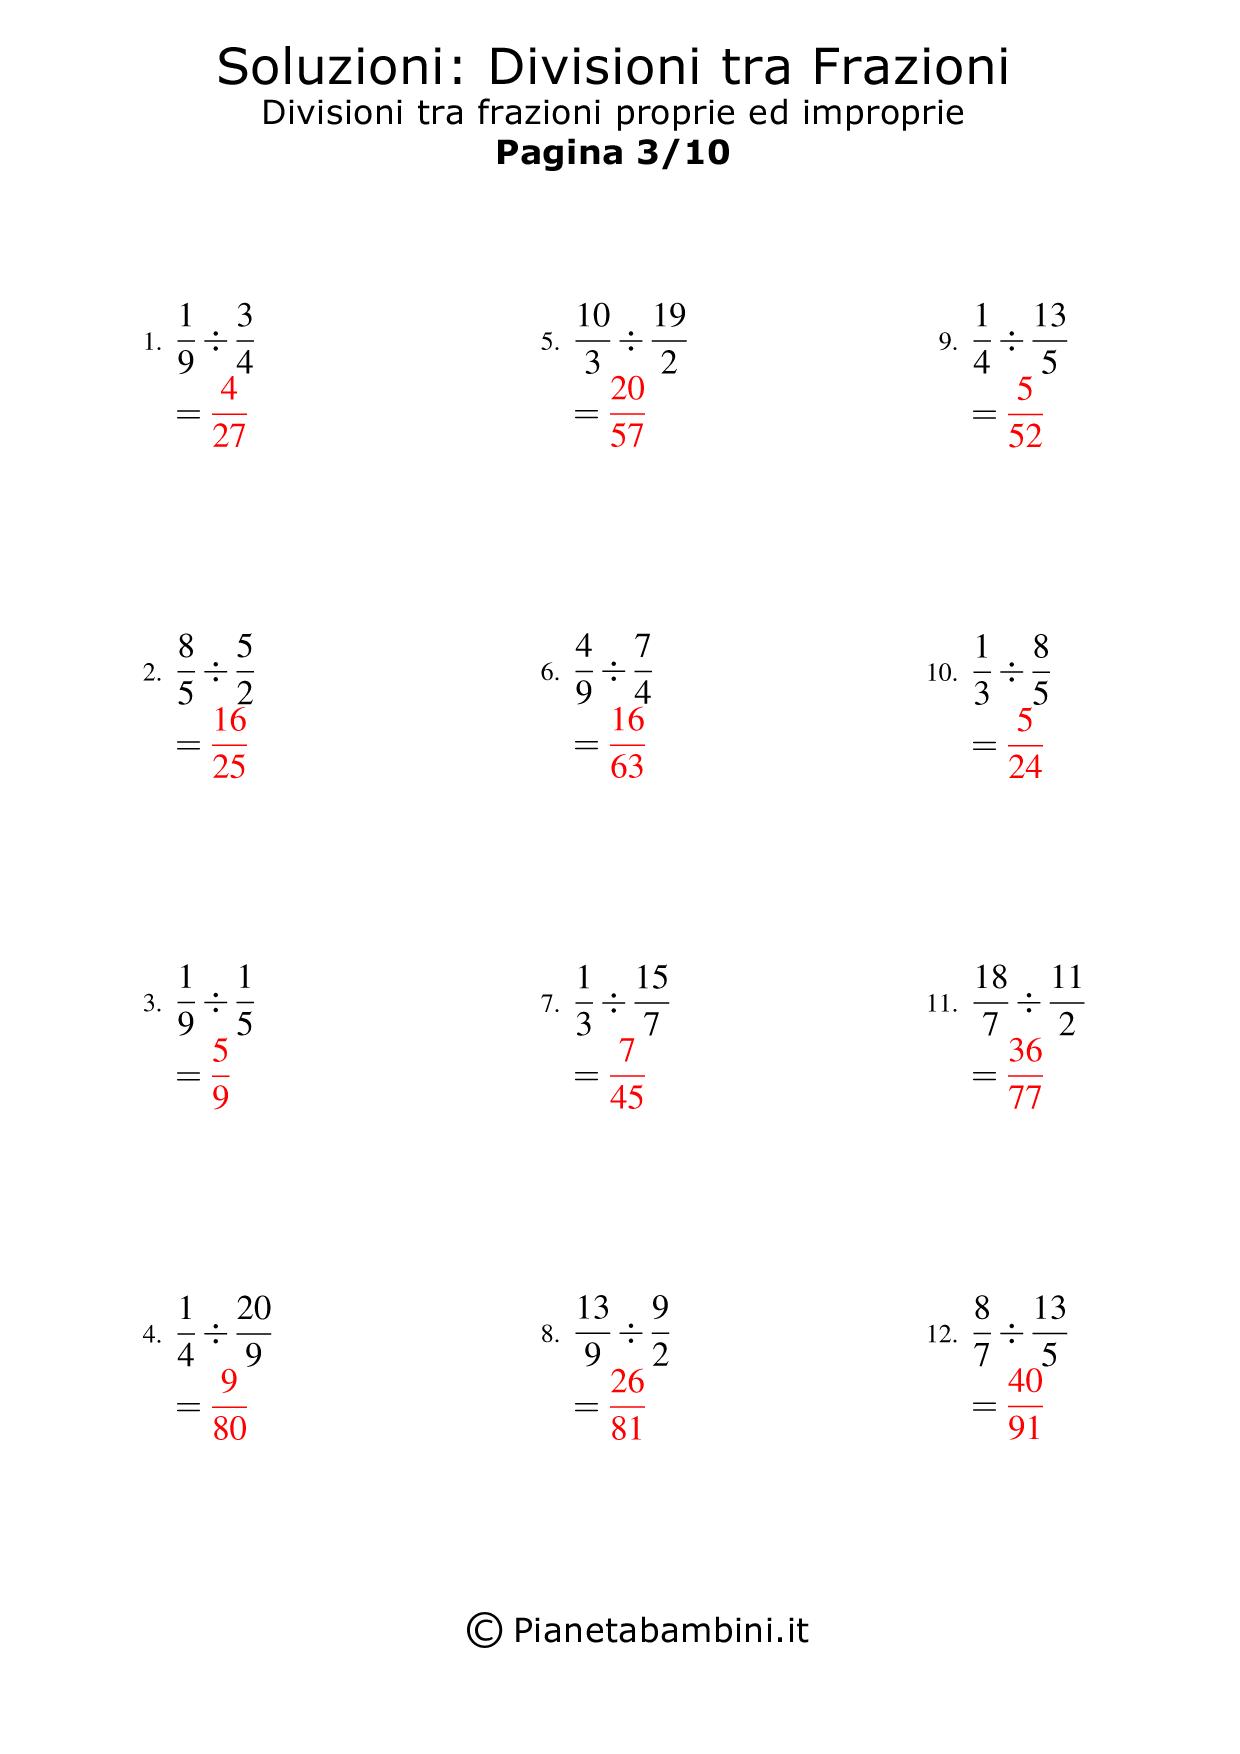 Soluzioni-Divisioni-Frazioni-Proprie-Improprie_03